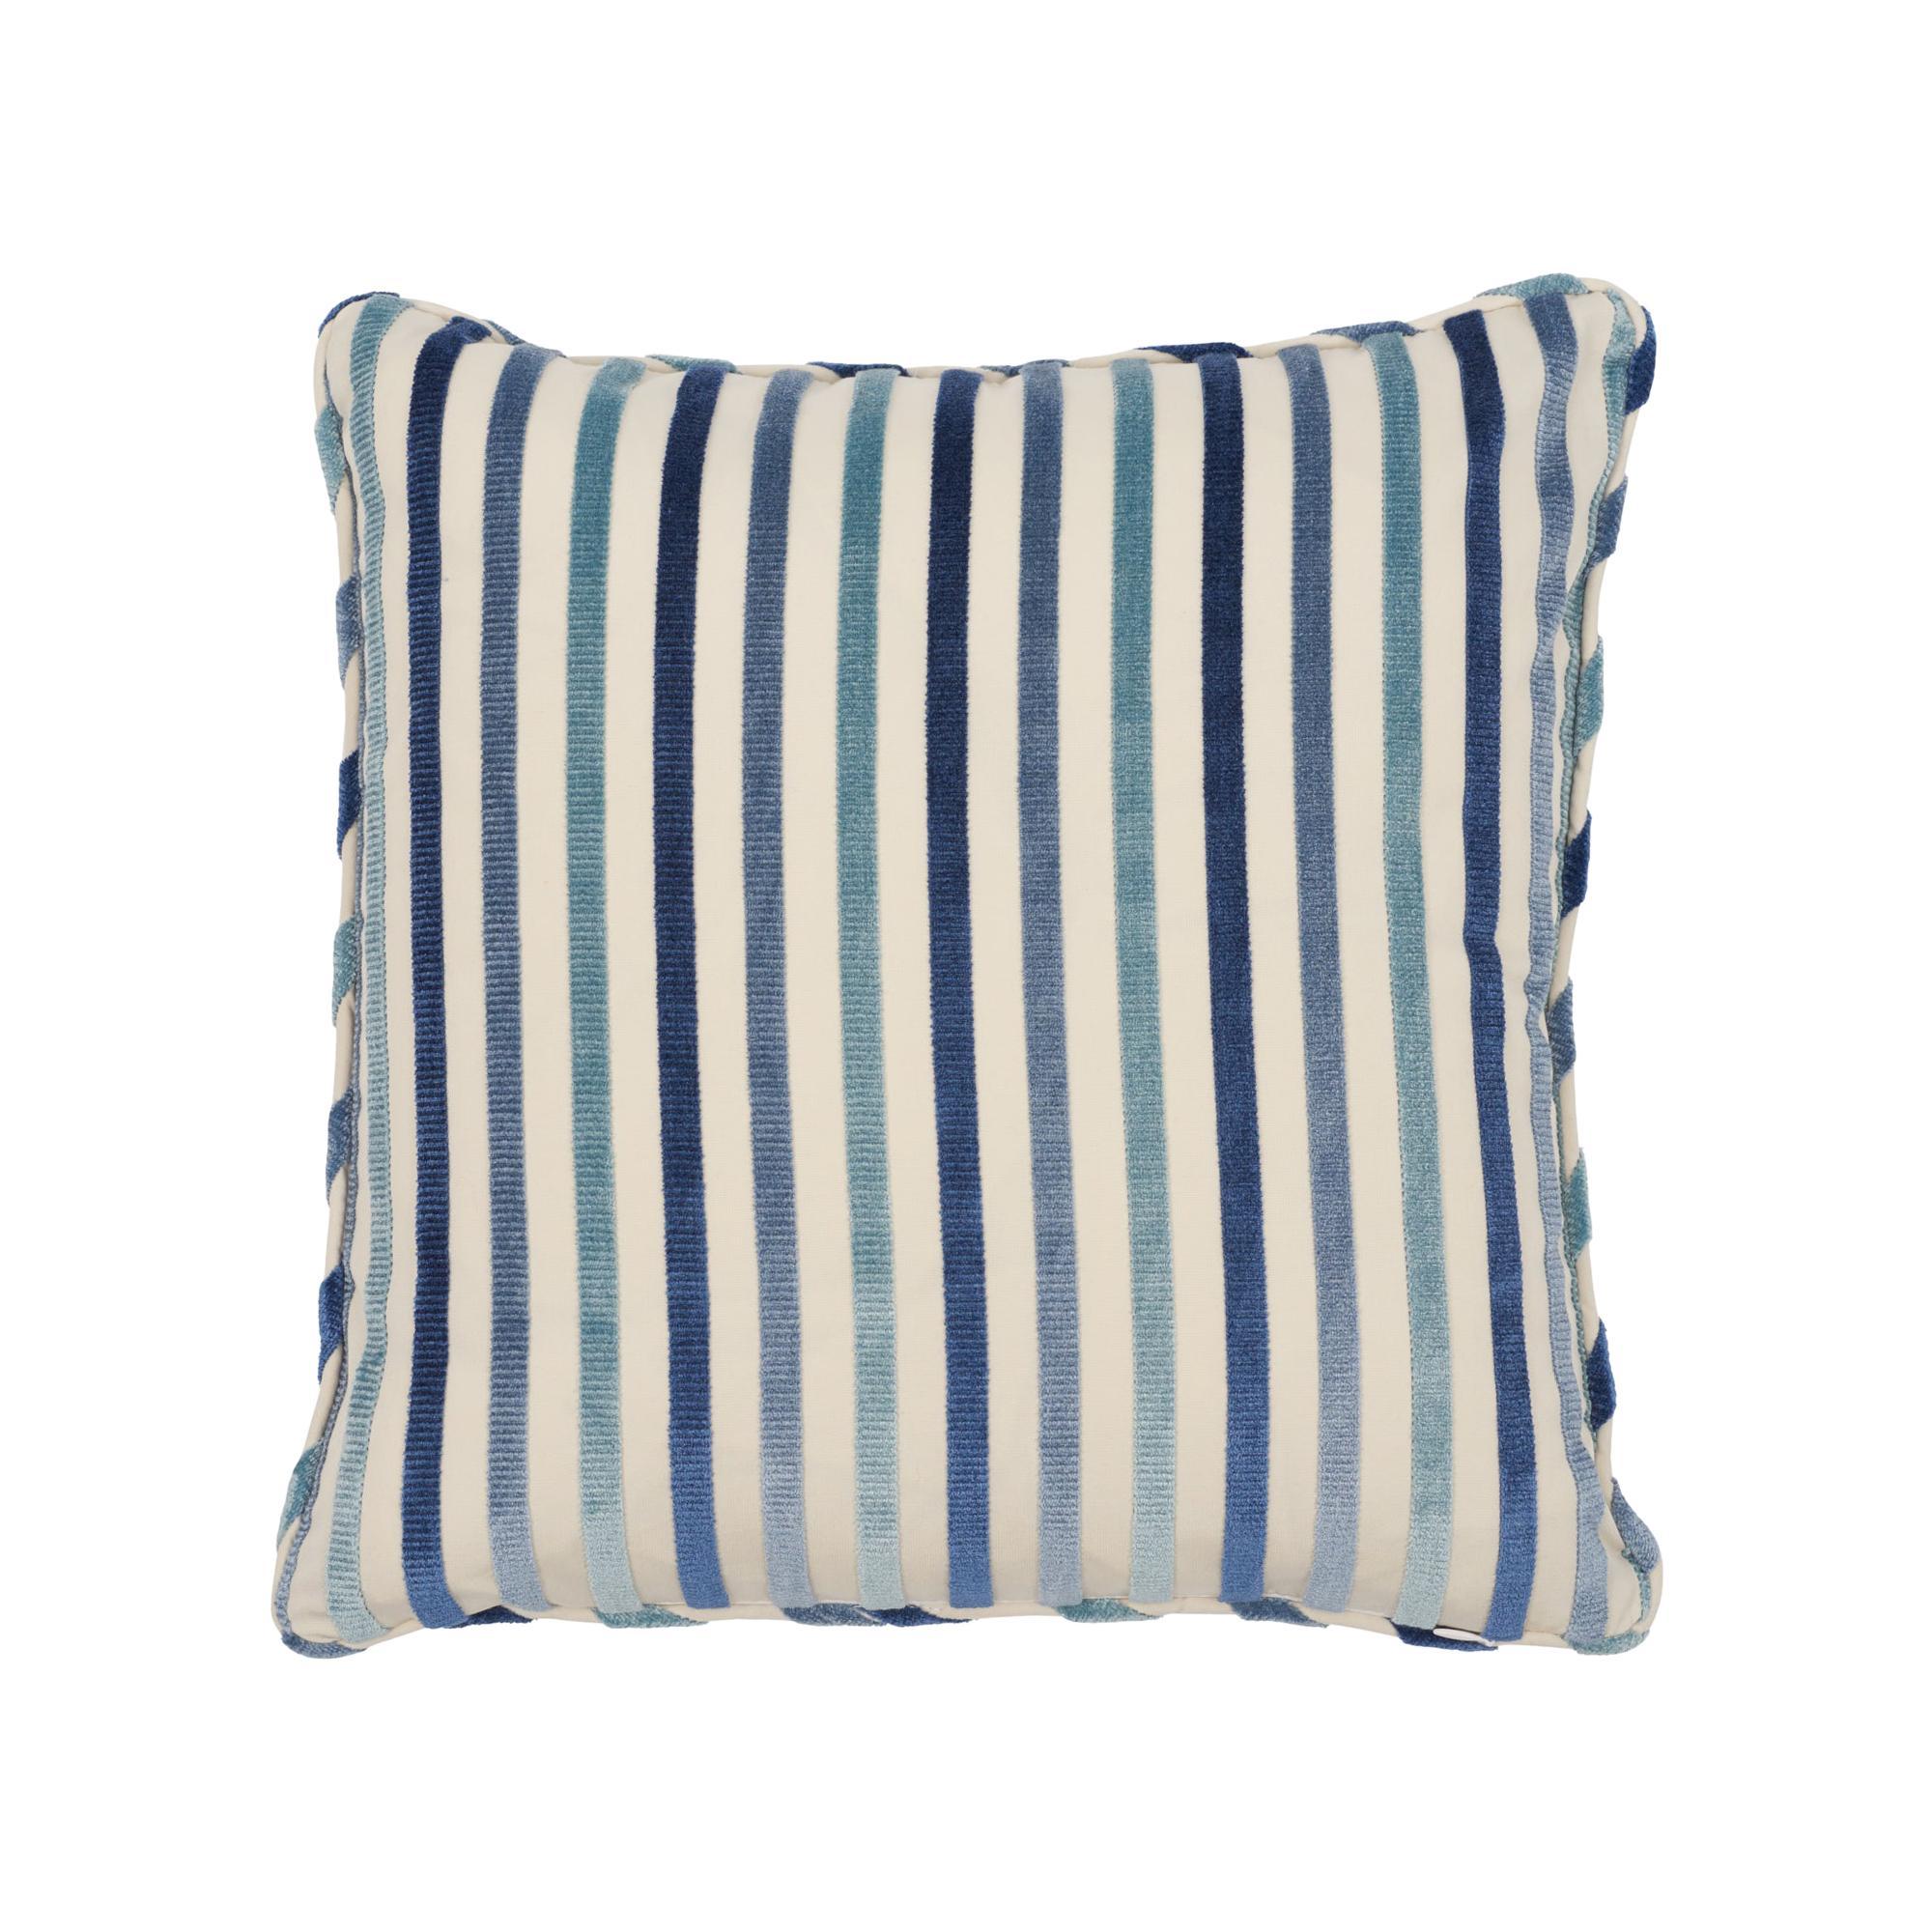 Schumacher Le Matelot Blue Two-Sided Pillow